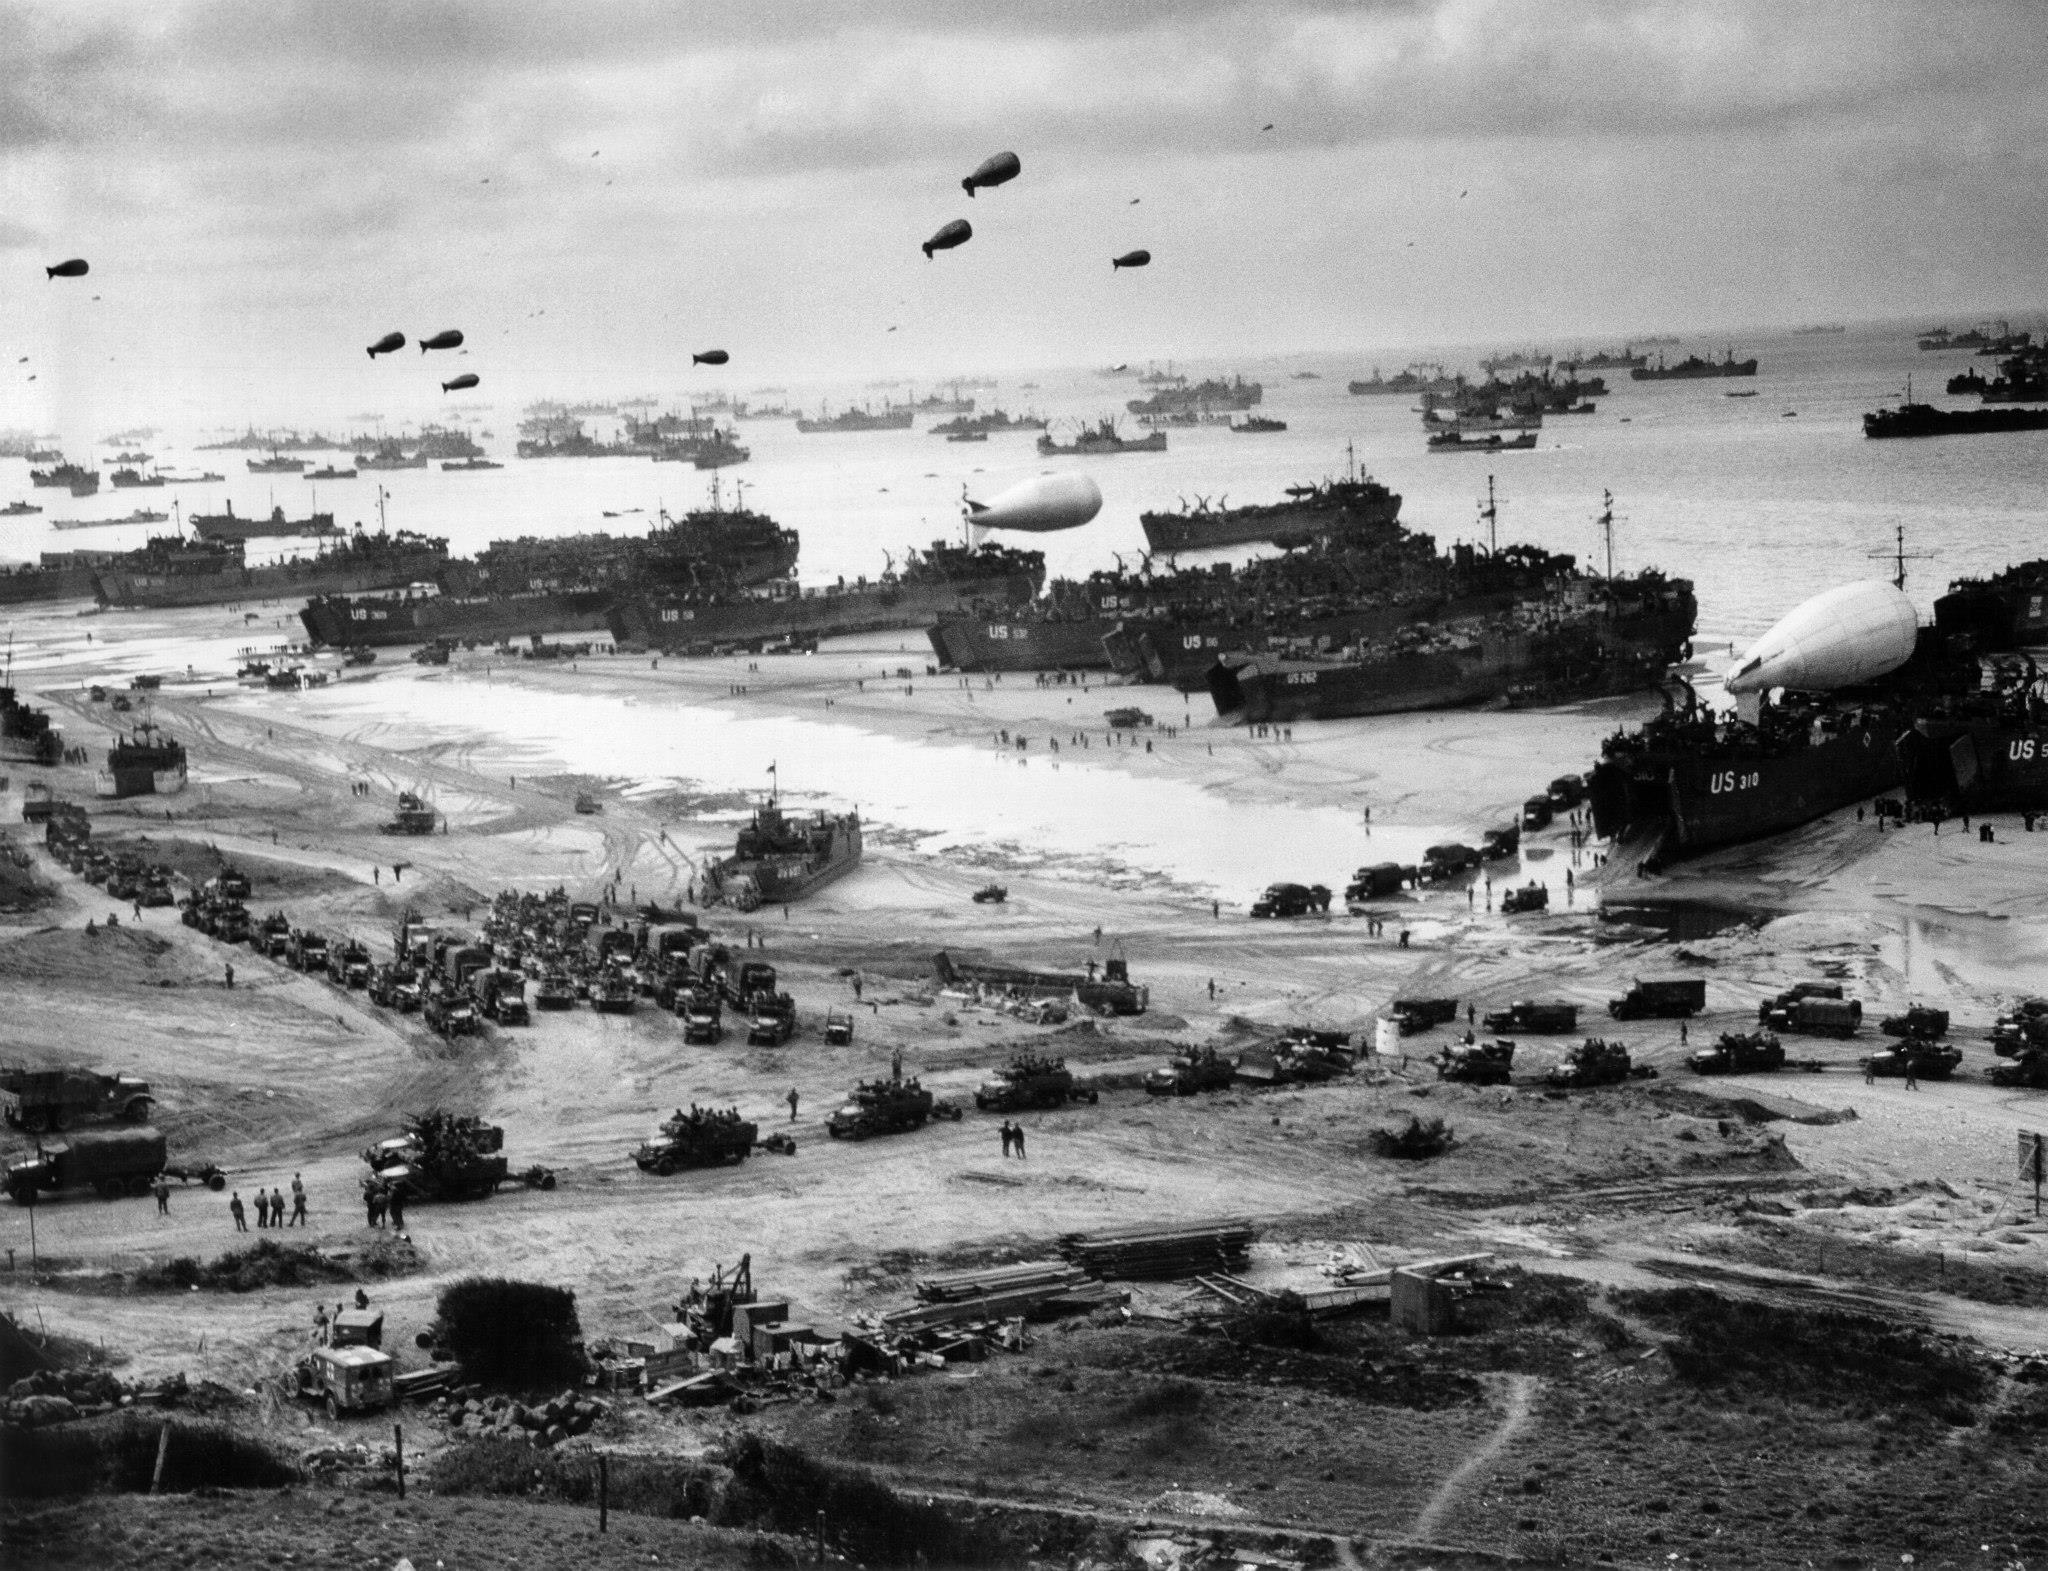 Omaha Beach de 'Le Ruquet' Draw, Normandie, Frankrijk 1944